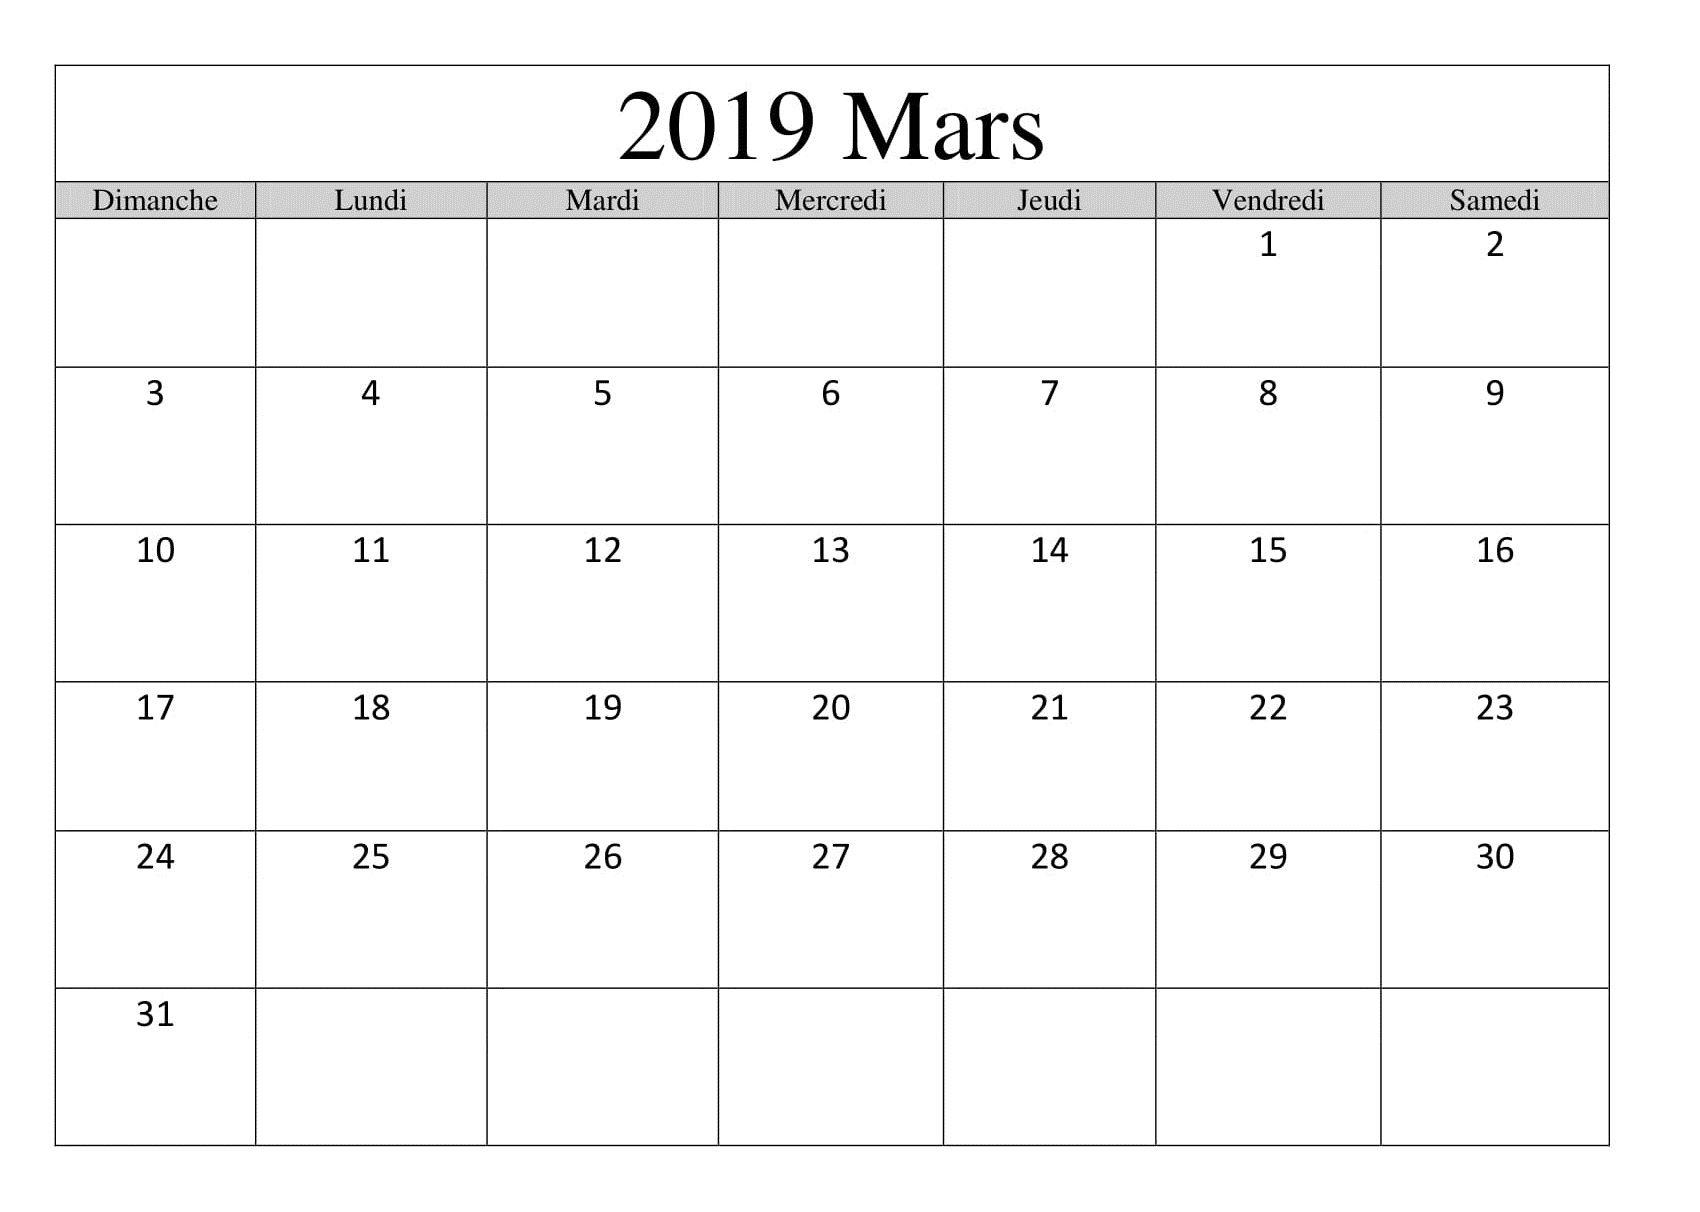 Calendrier 2019 Excel Vacances Scolaires.Calendrier Mars 2019 Excel Pour Vacances Scolaires March